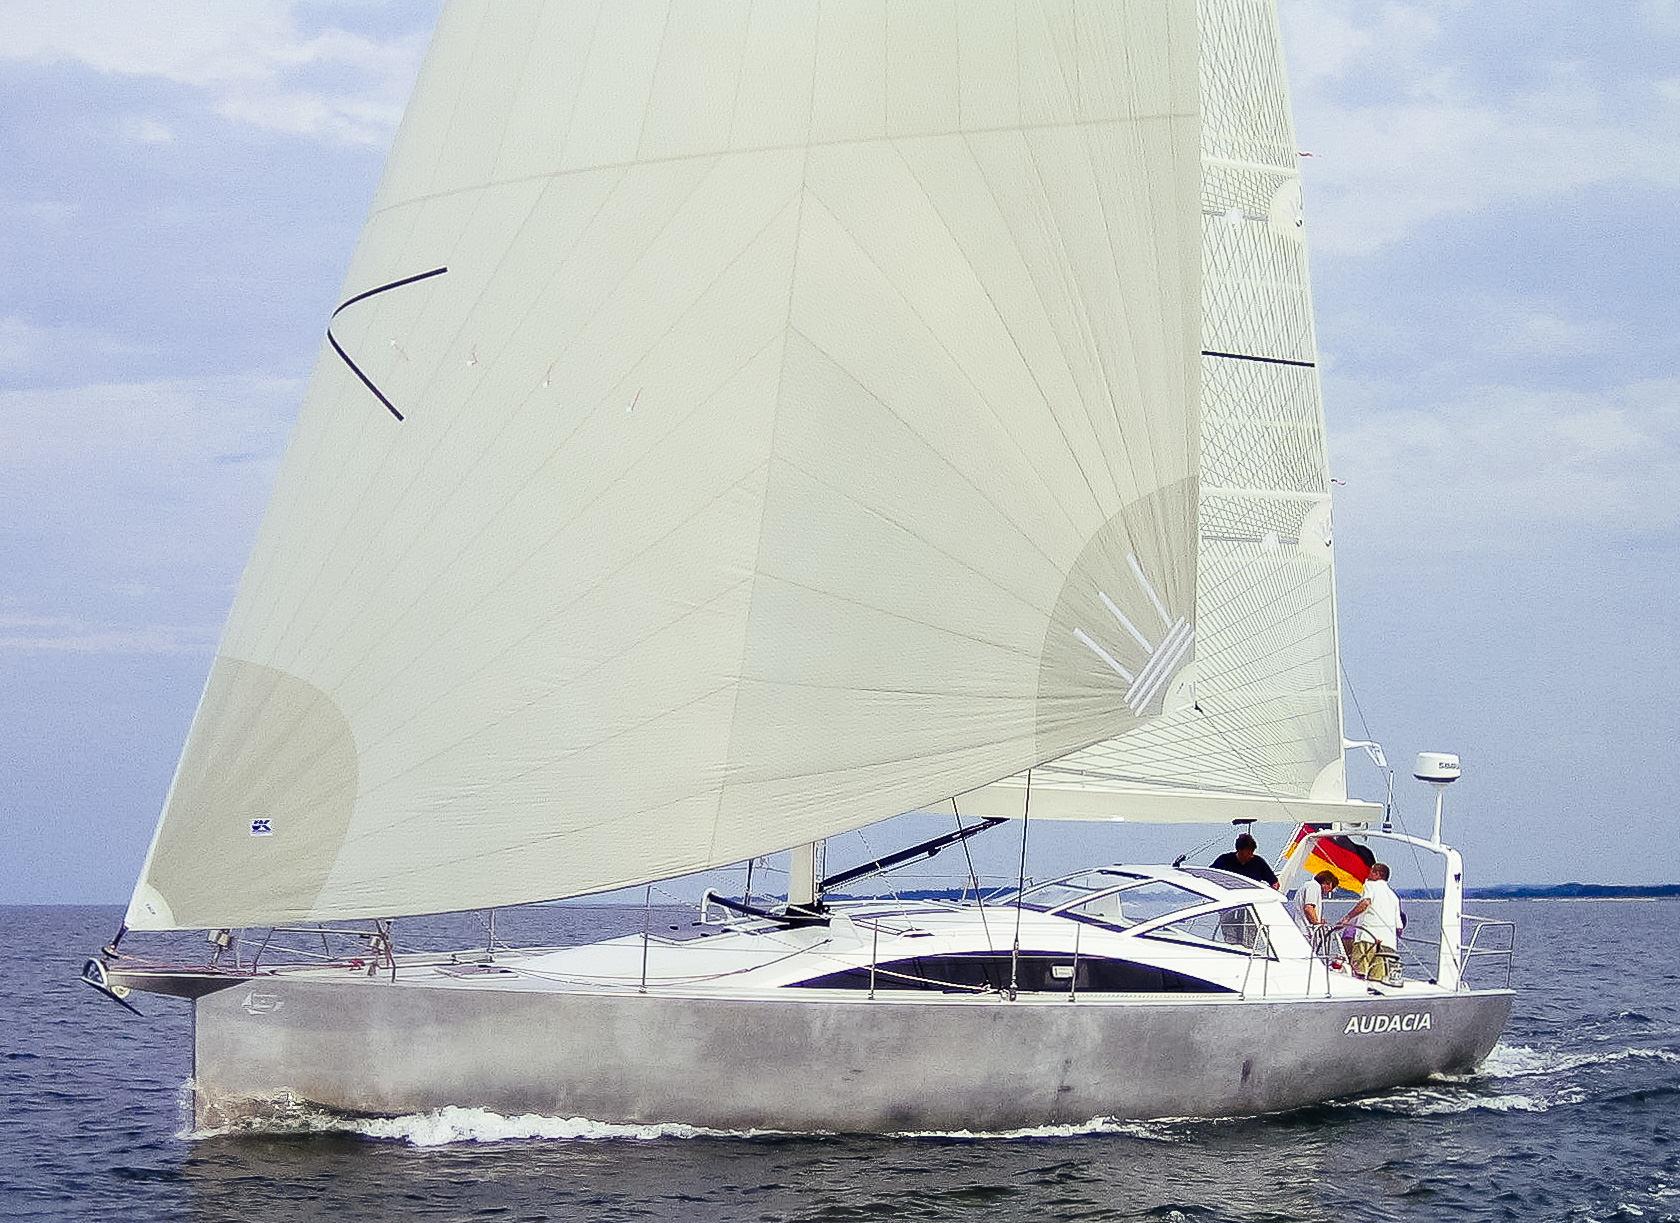 UK Sailmakers BM45 Code0